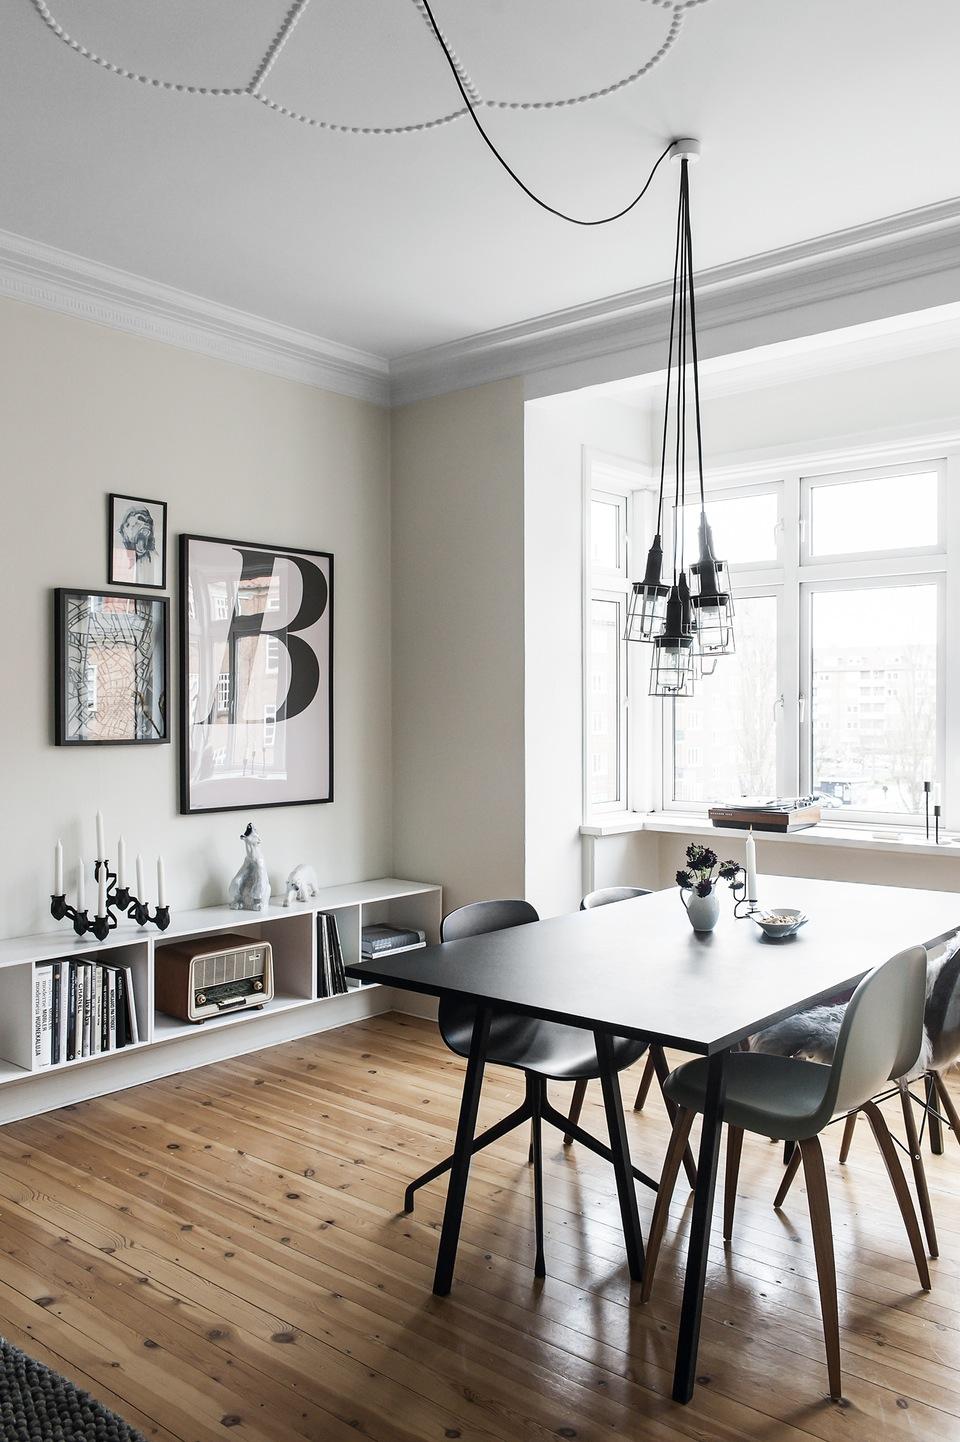 Estilo nordico escandinavia estilonordico estilo moderno - Decoracion salones minimalistas ...